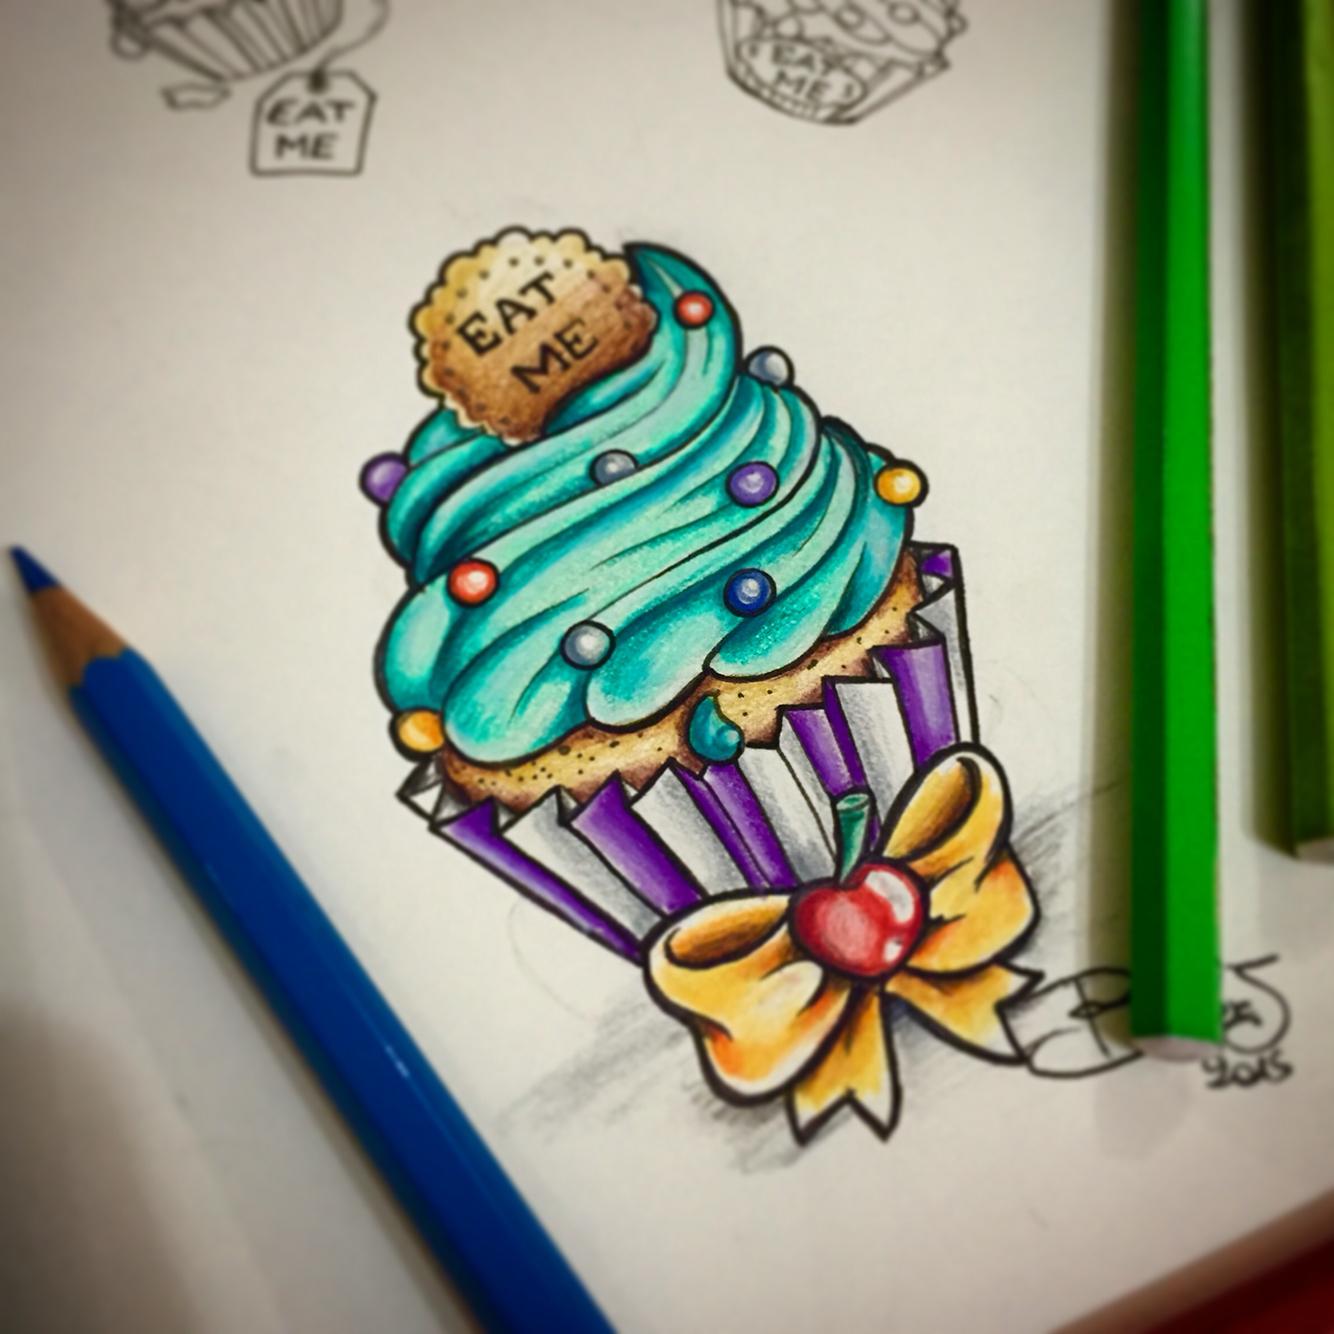 Drawn sweets colorful cupcake In Sweet tattoo wonderland tattoo